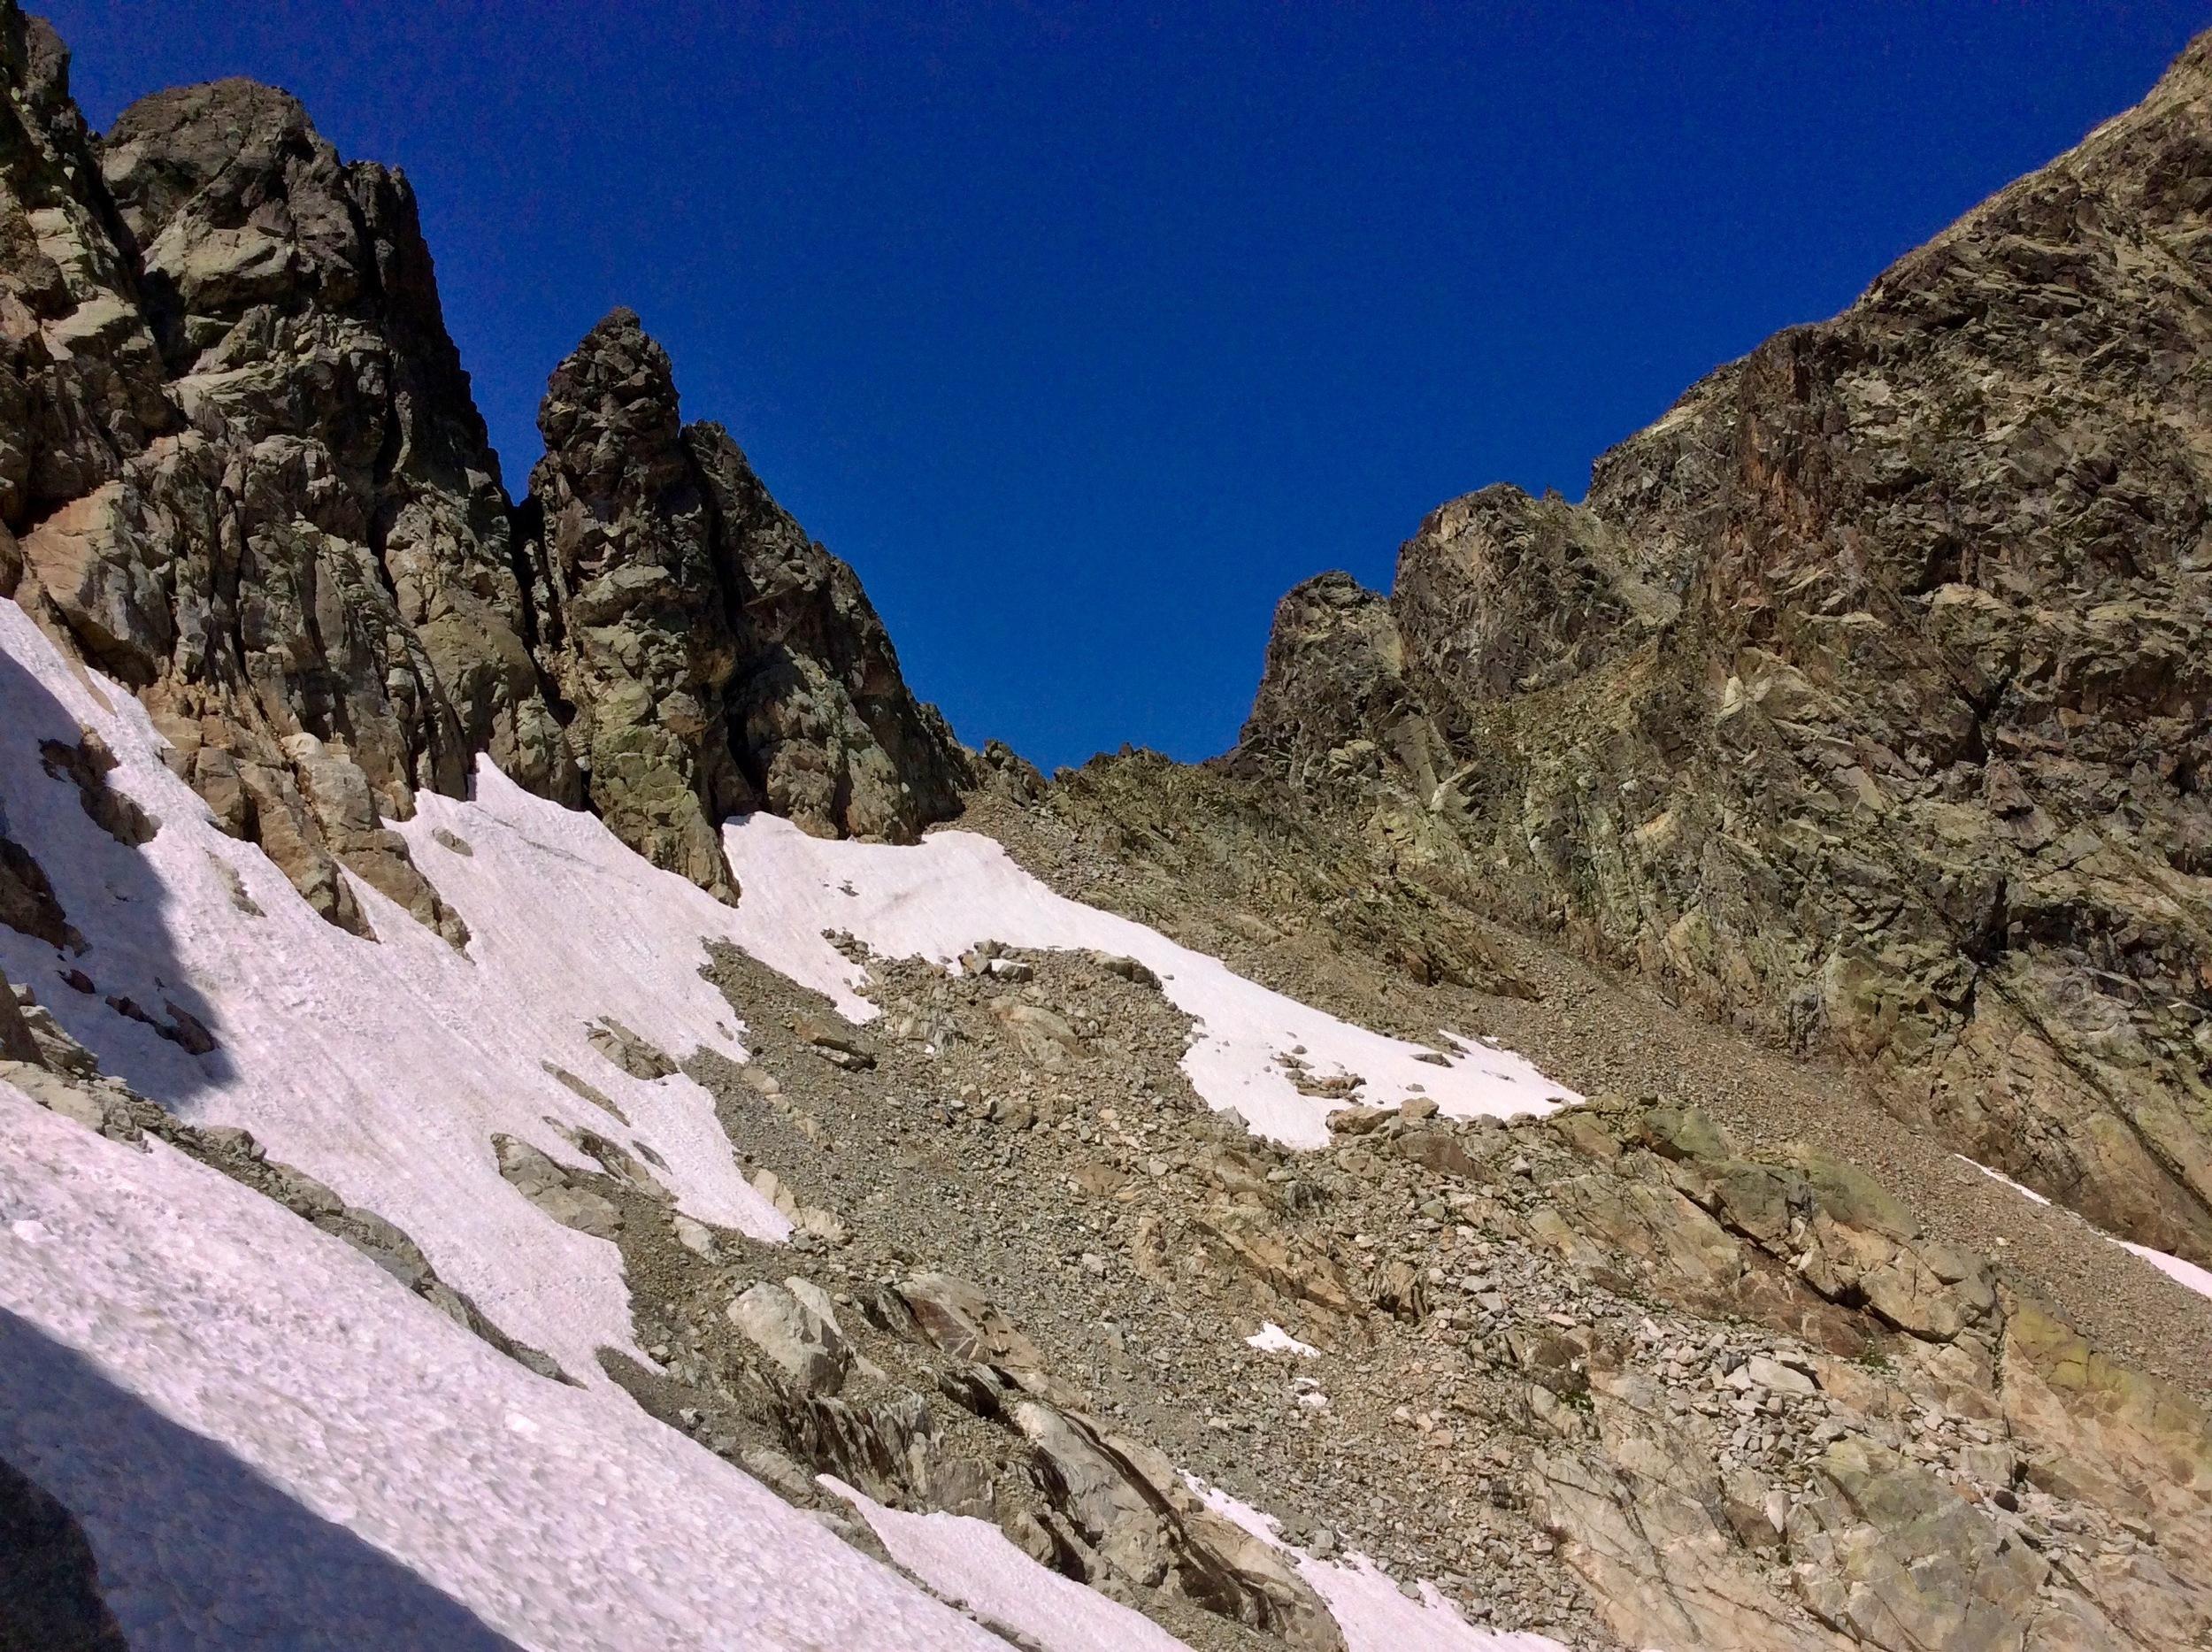 Traversing snowfields